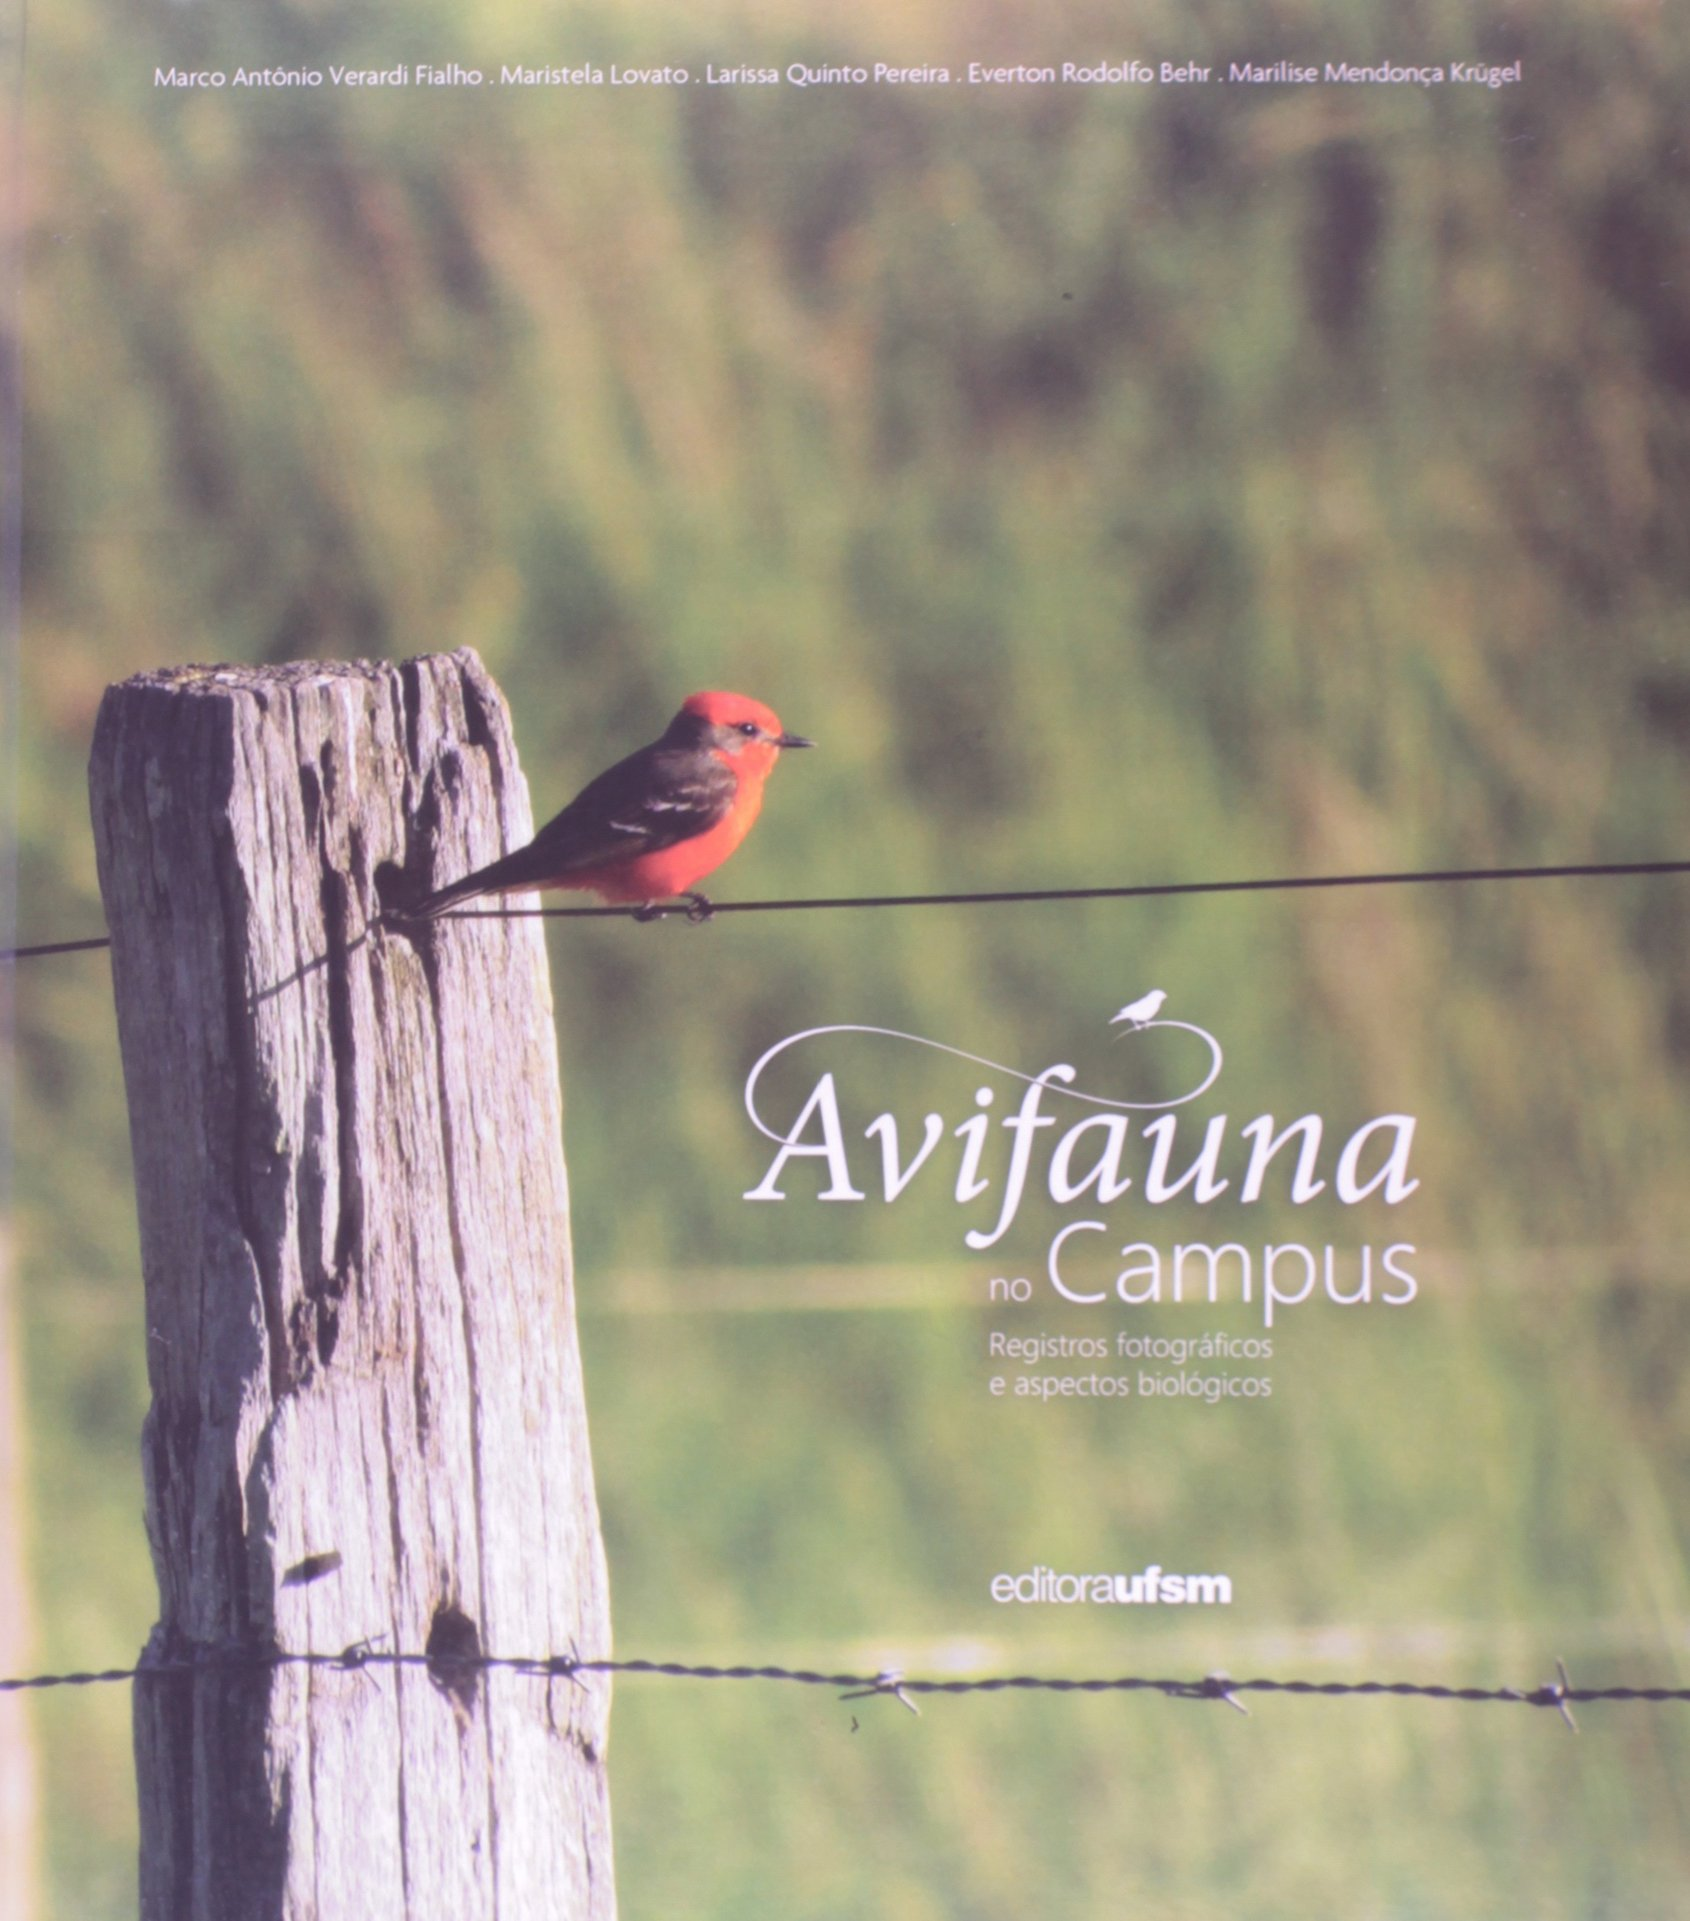 Avifauna No Campus. Registros Fotográficos E Aspectos Biológicos (Portuguese Brazilian) Hardcover – 2013